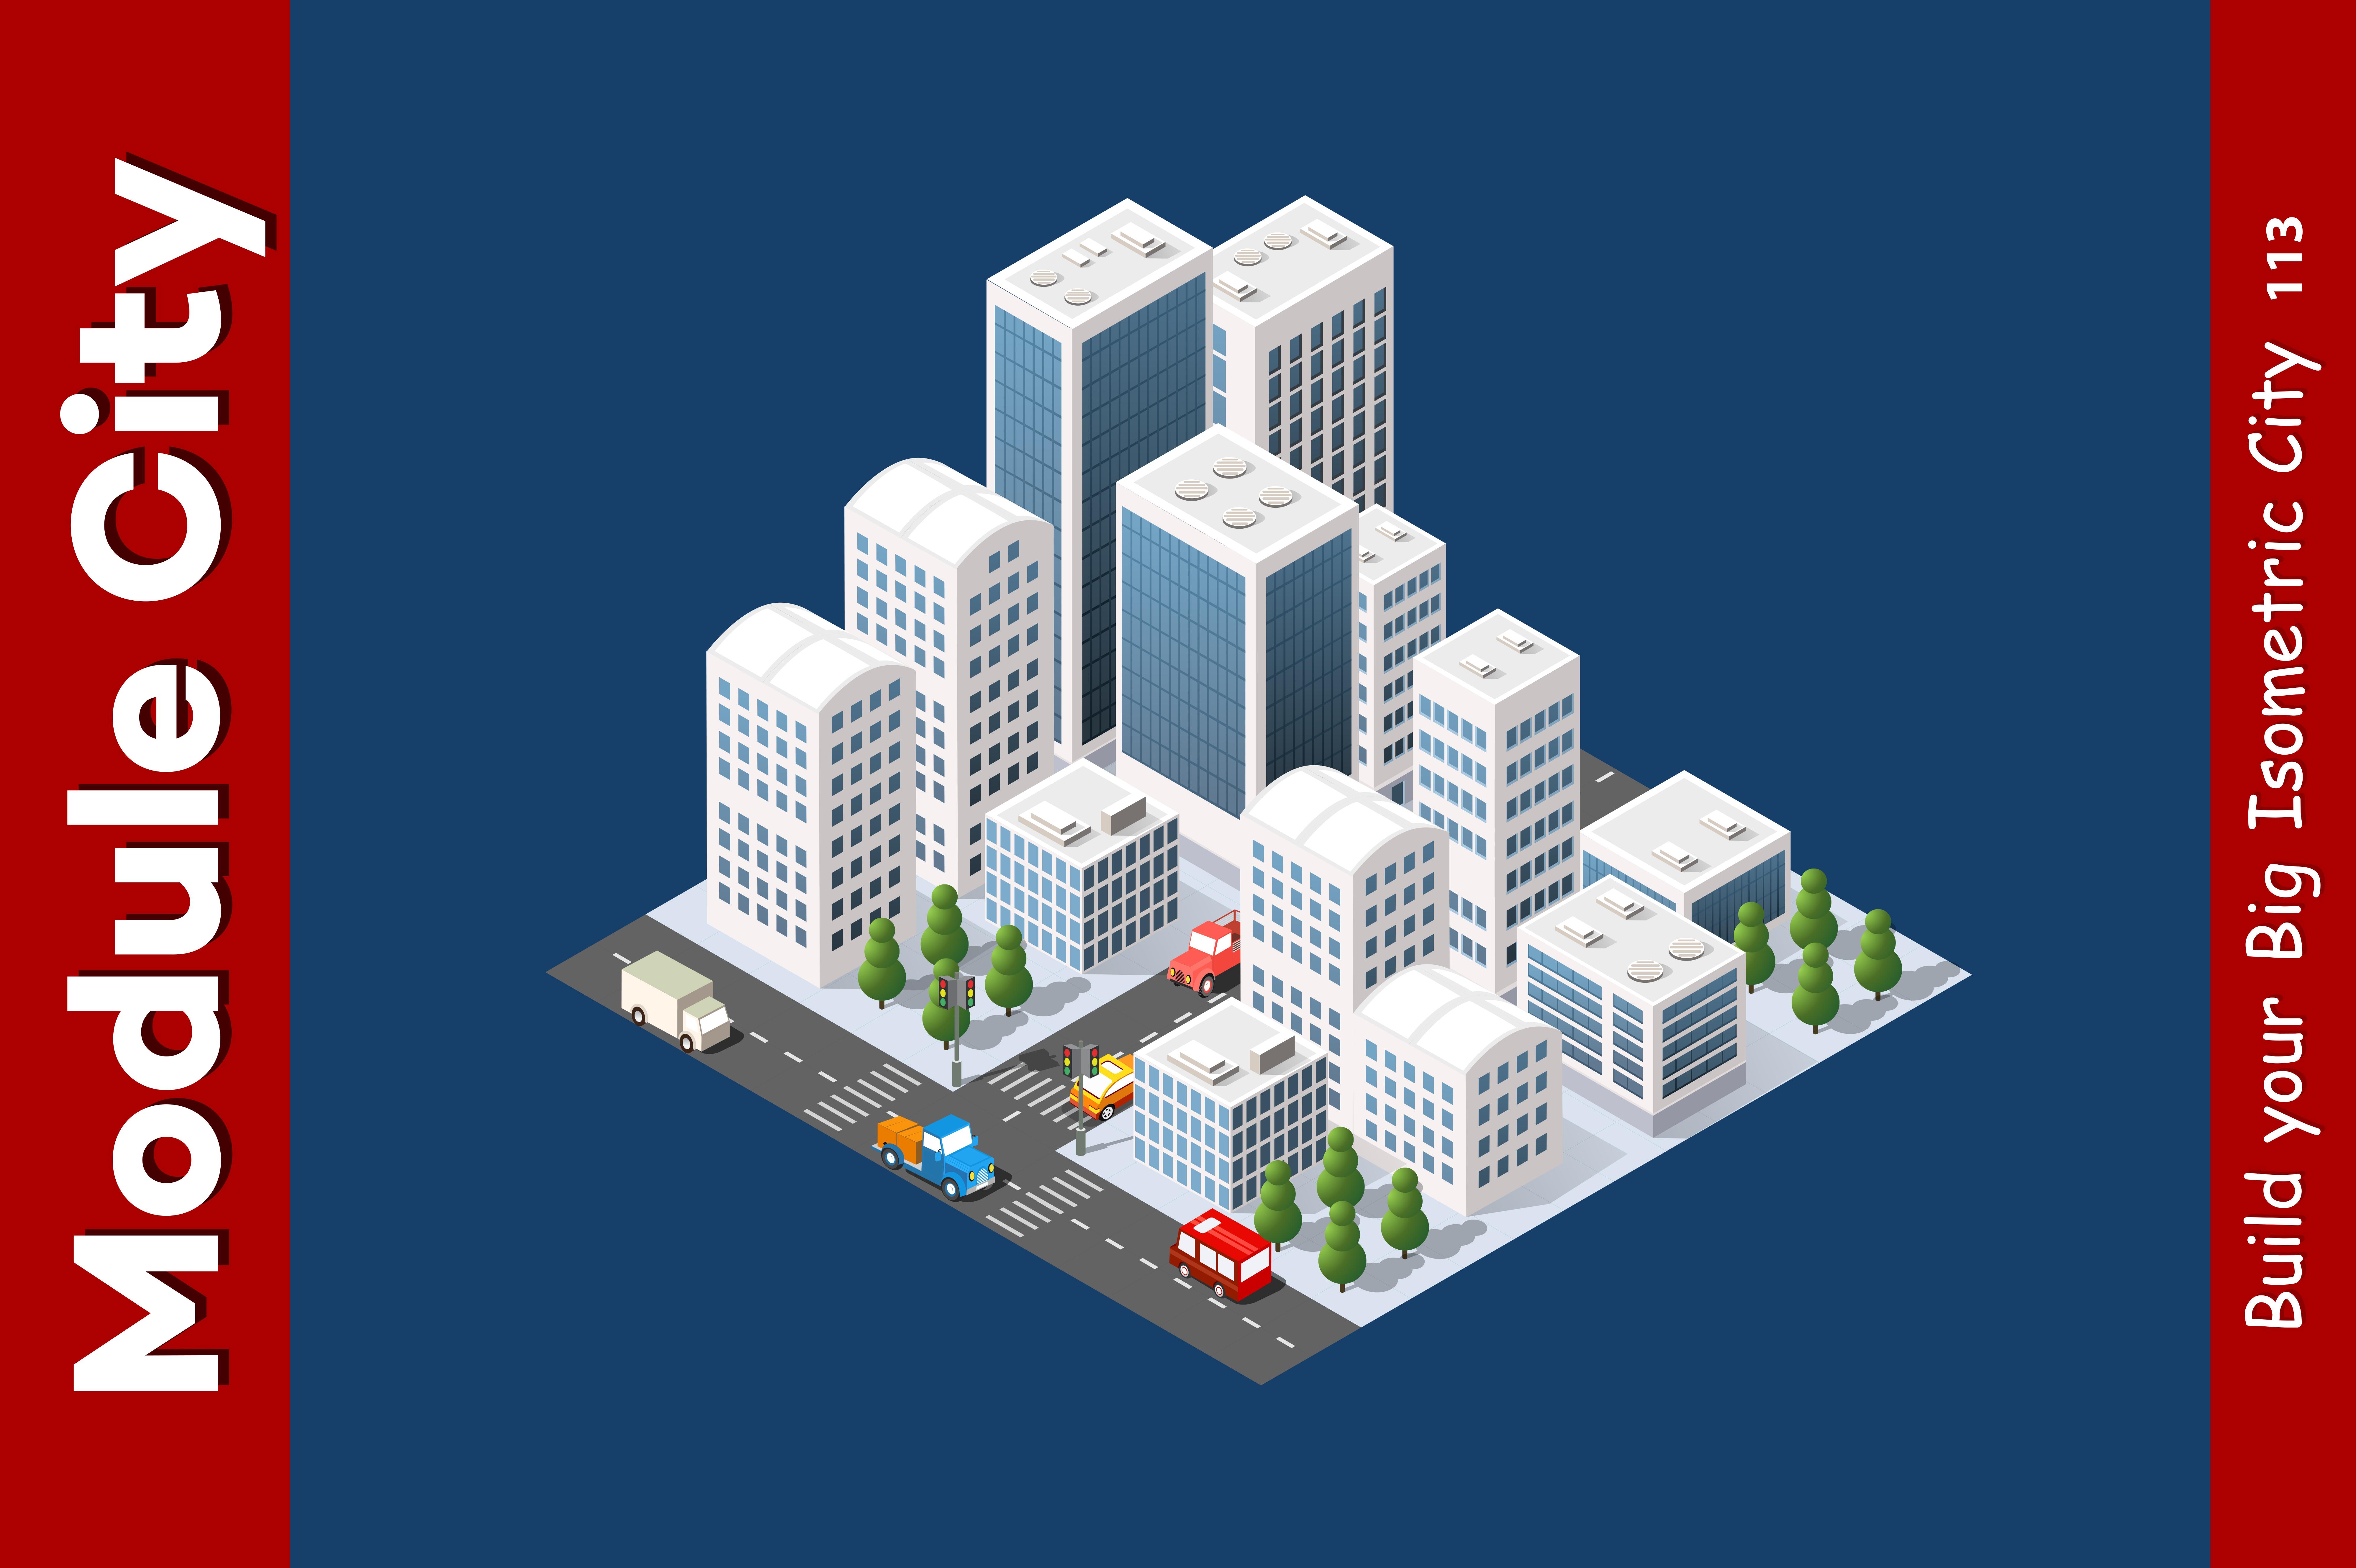 Isometric 3d landscape top download free vector art for Home design 3d professional italiano gratis